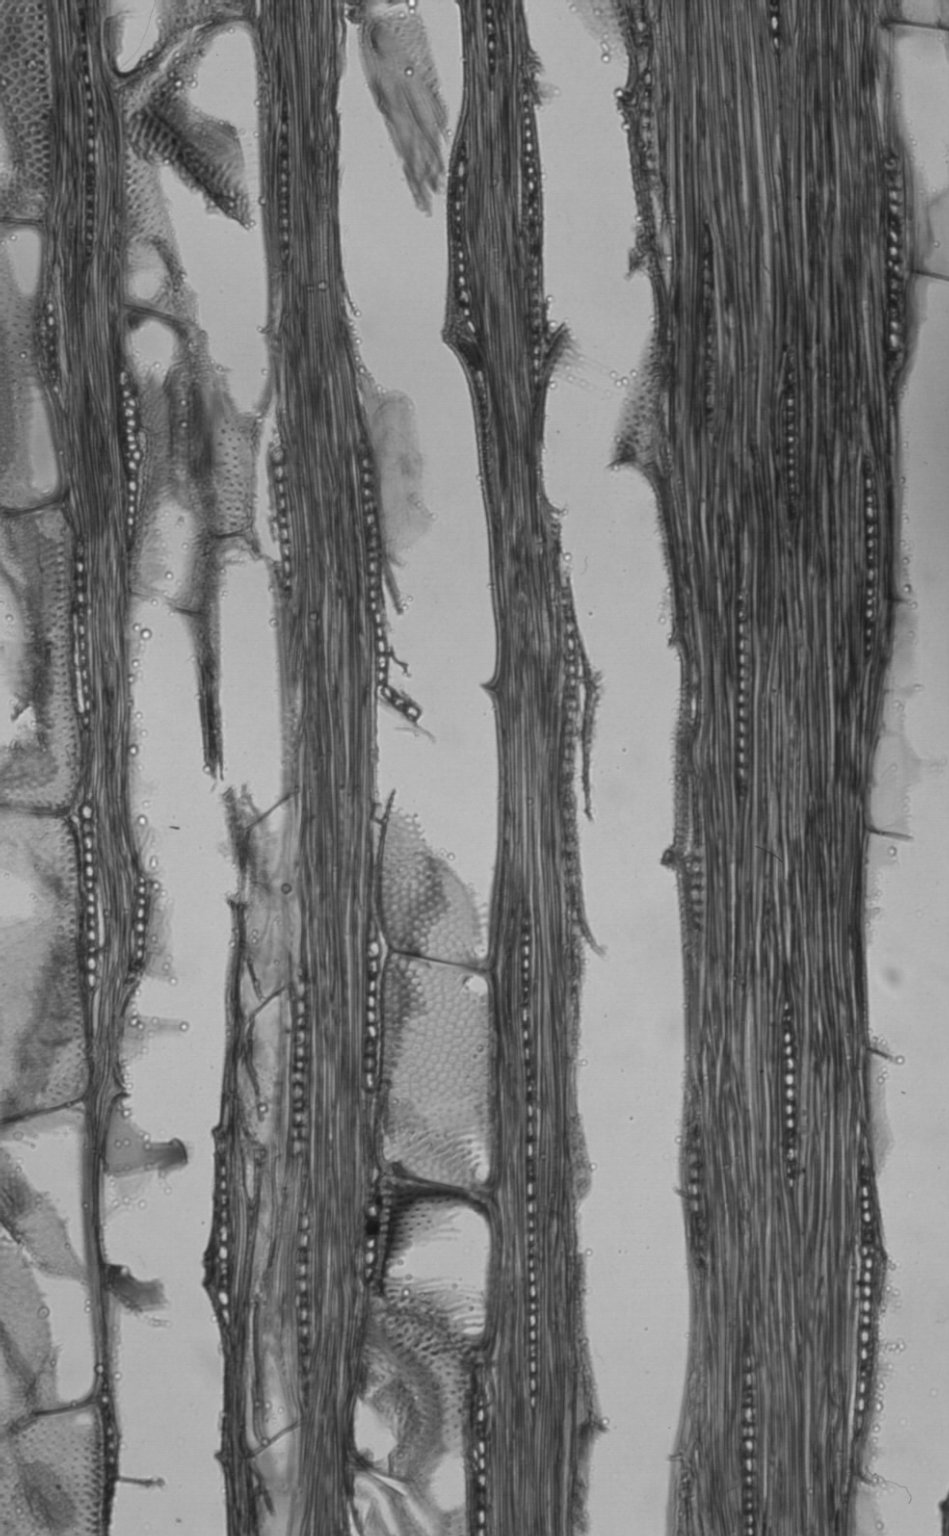 LEGUMINOSAE CAESALPINIOIDEAE Mimosoid Clade Acacia doratoxylon